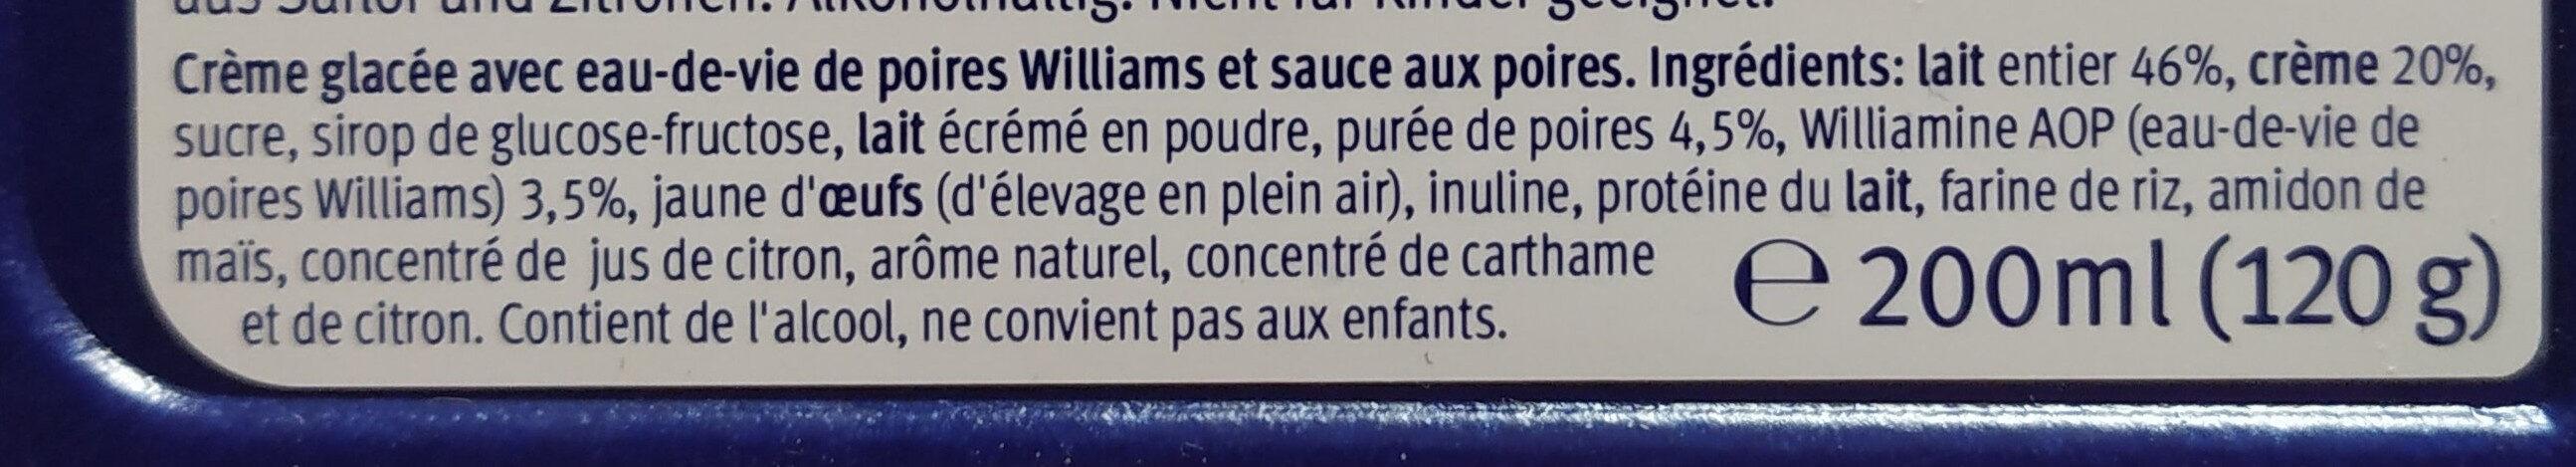 Poire Williamine crème glacée - Інгредієнти - fr